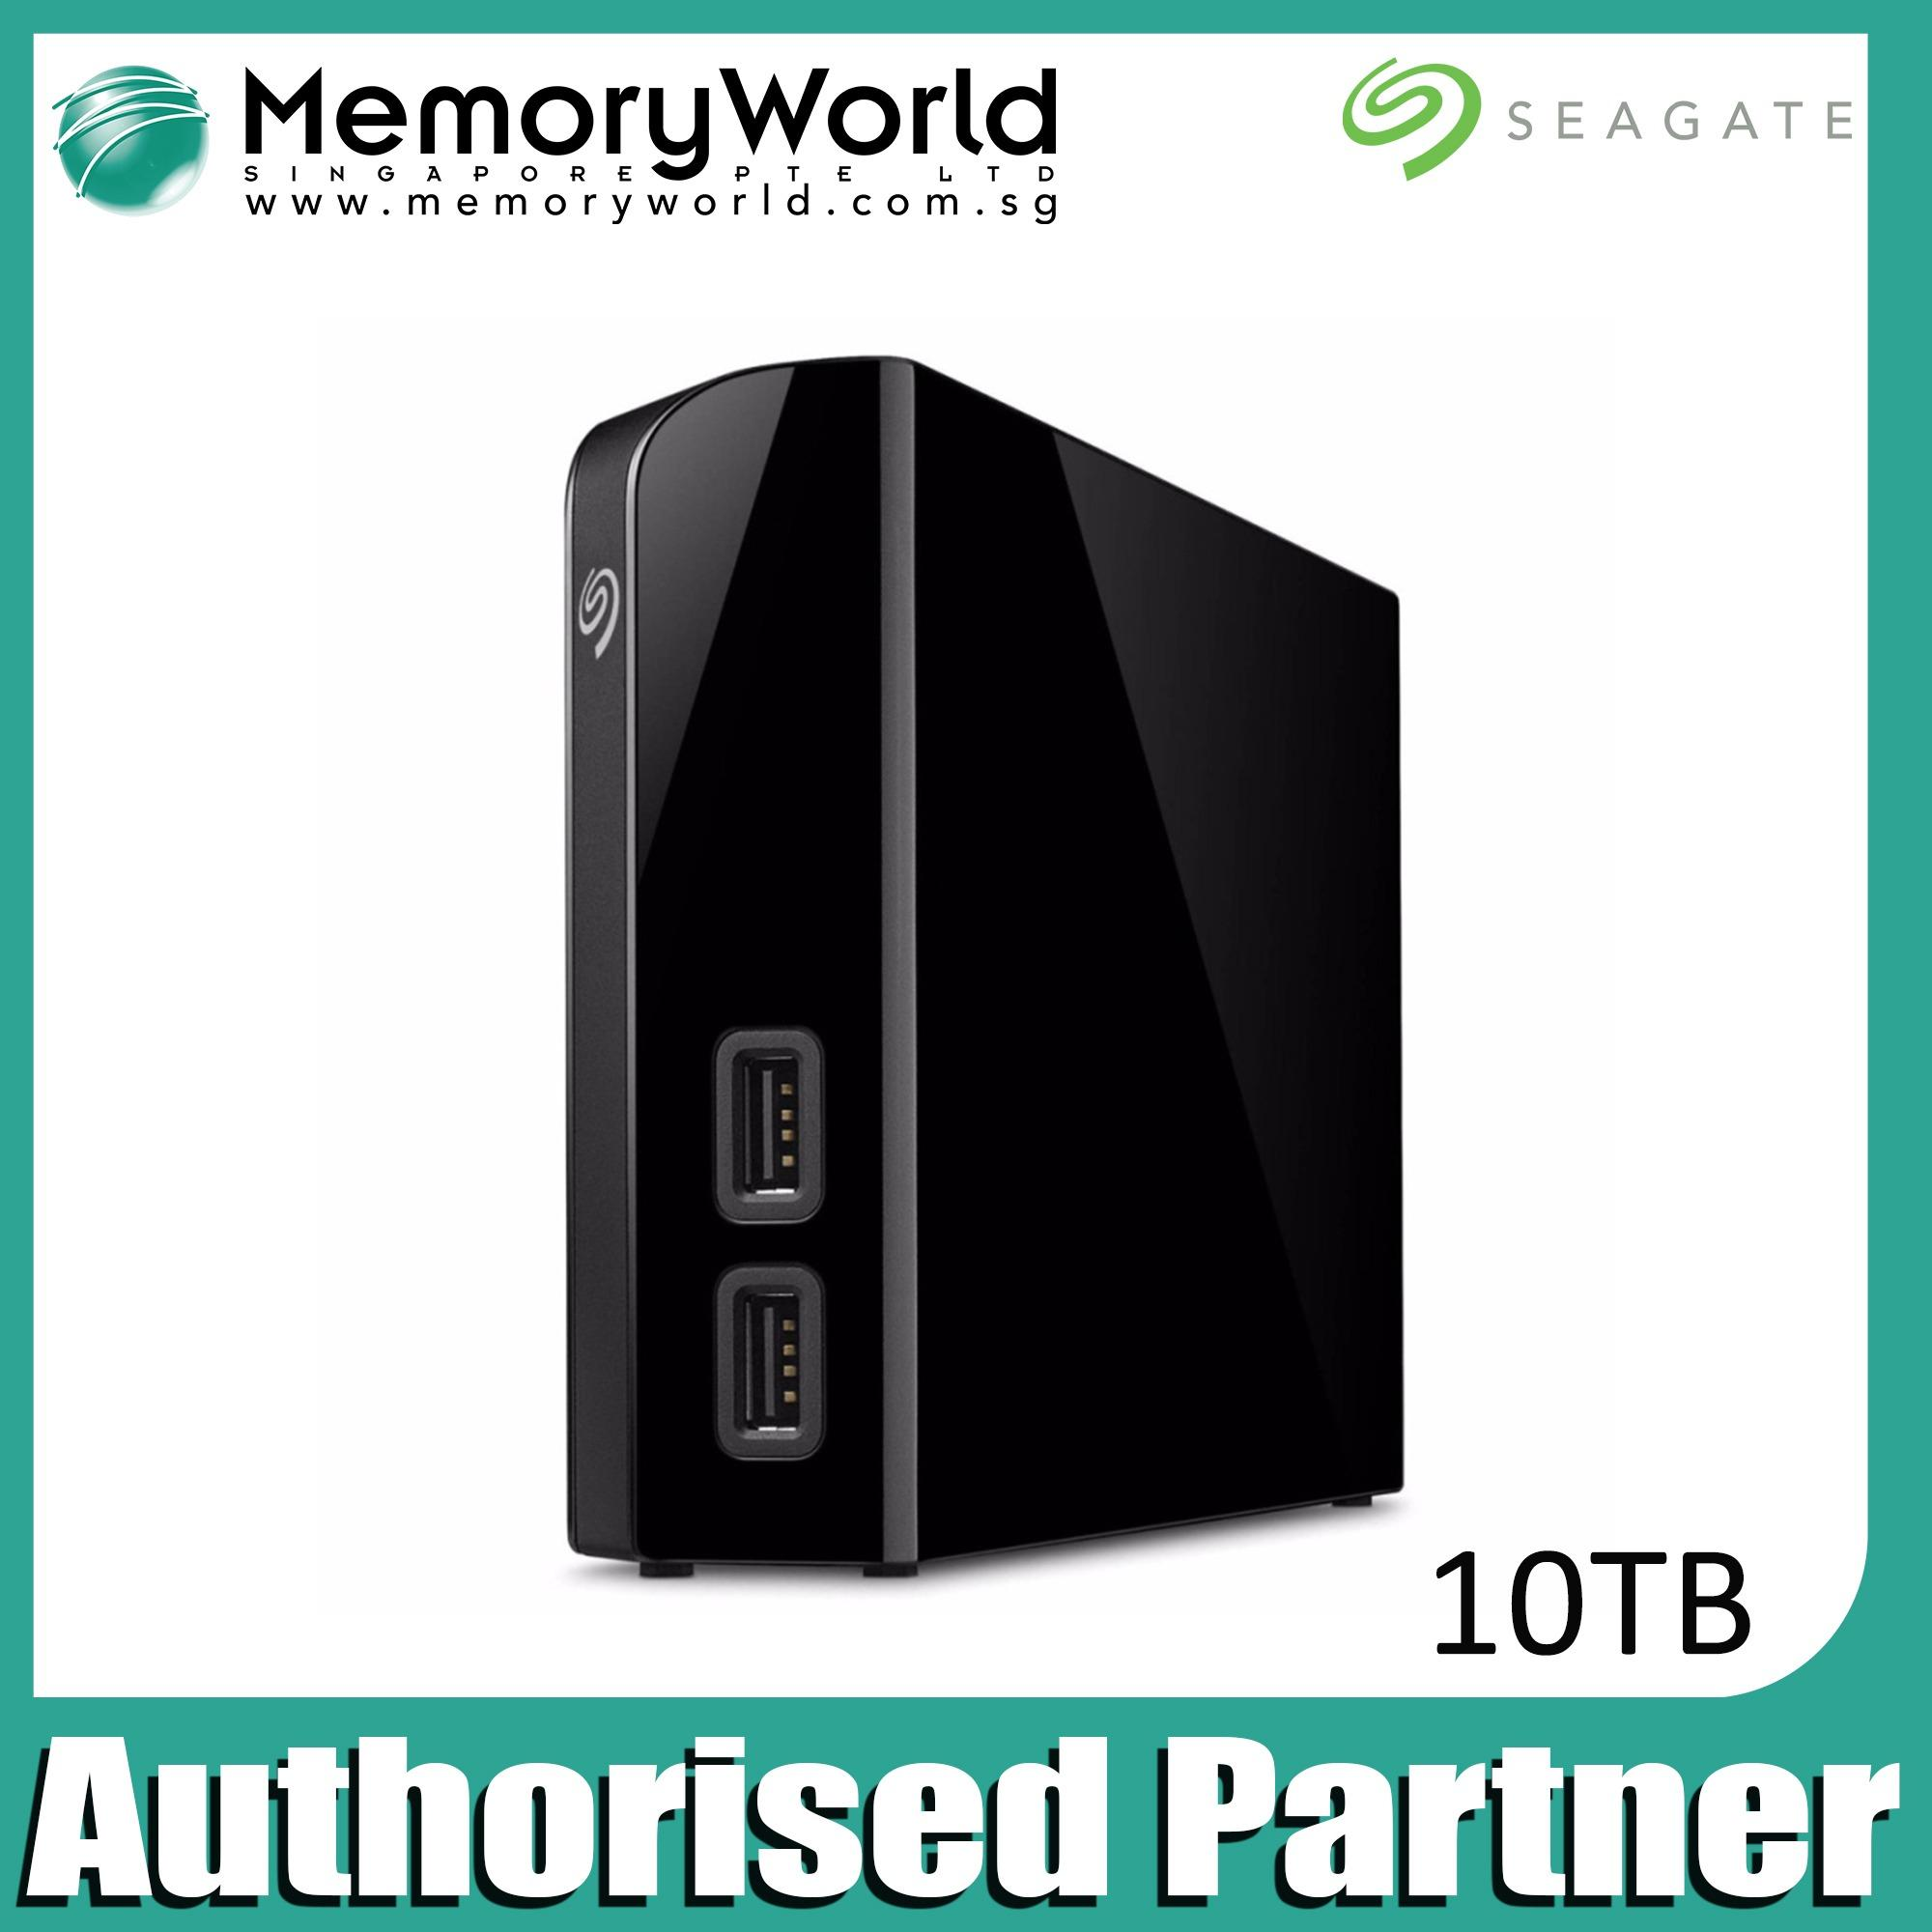 Seagate 10Tb Backup Plus Desktop Drive With Hub Coupon Code